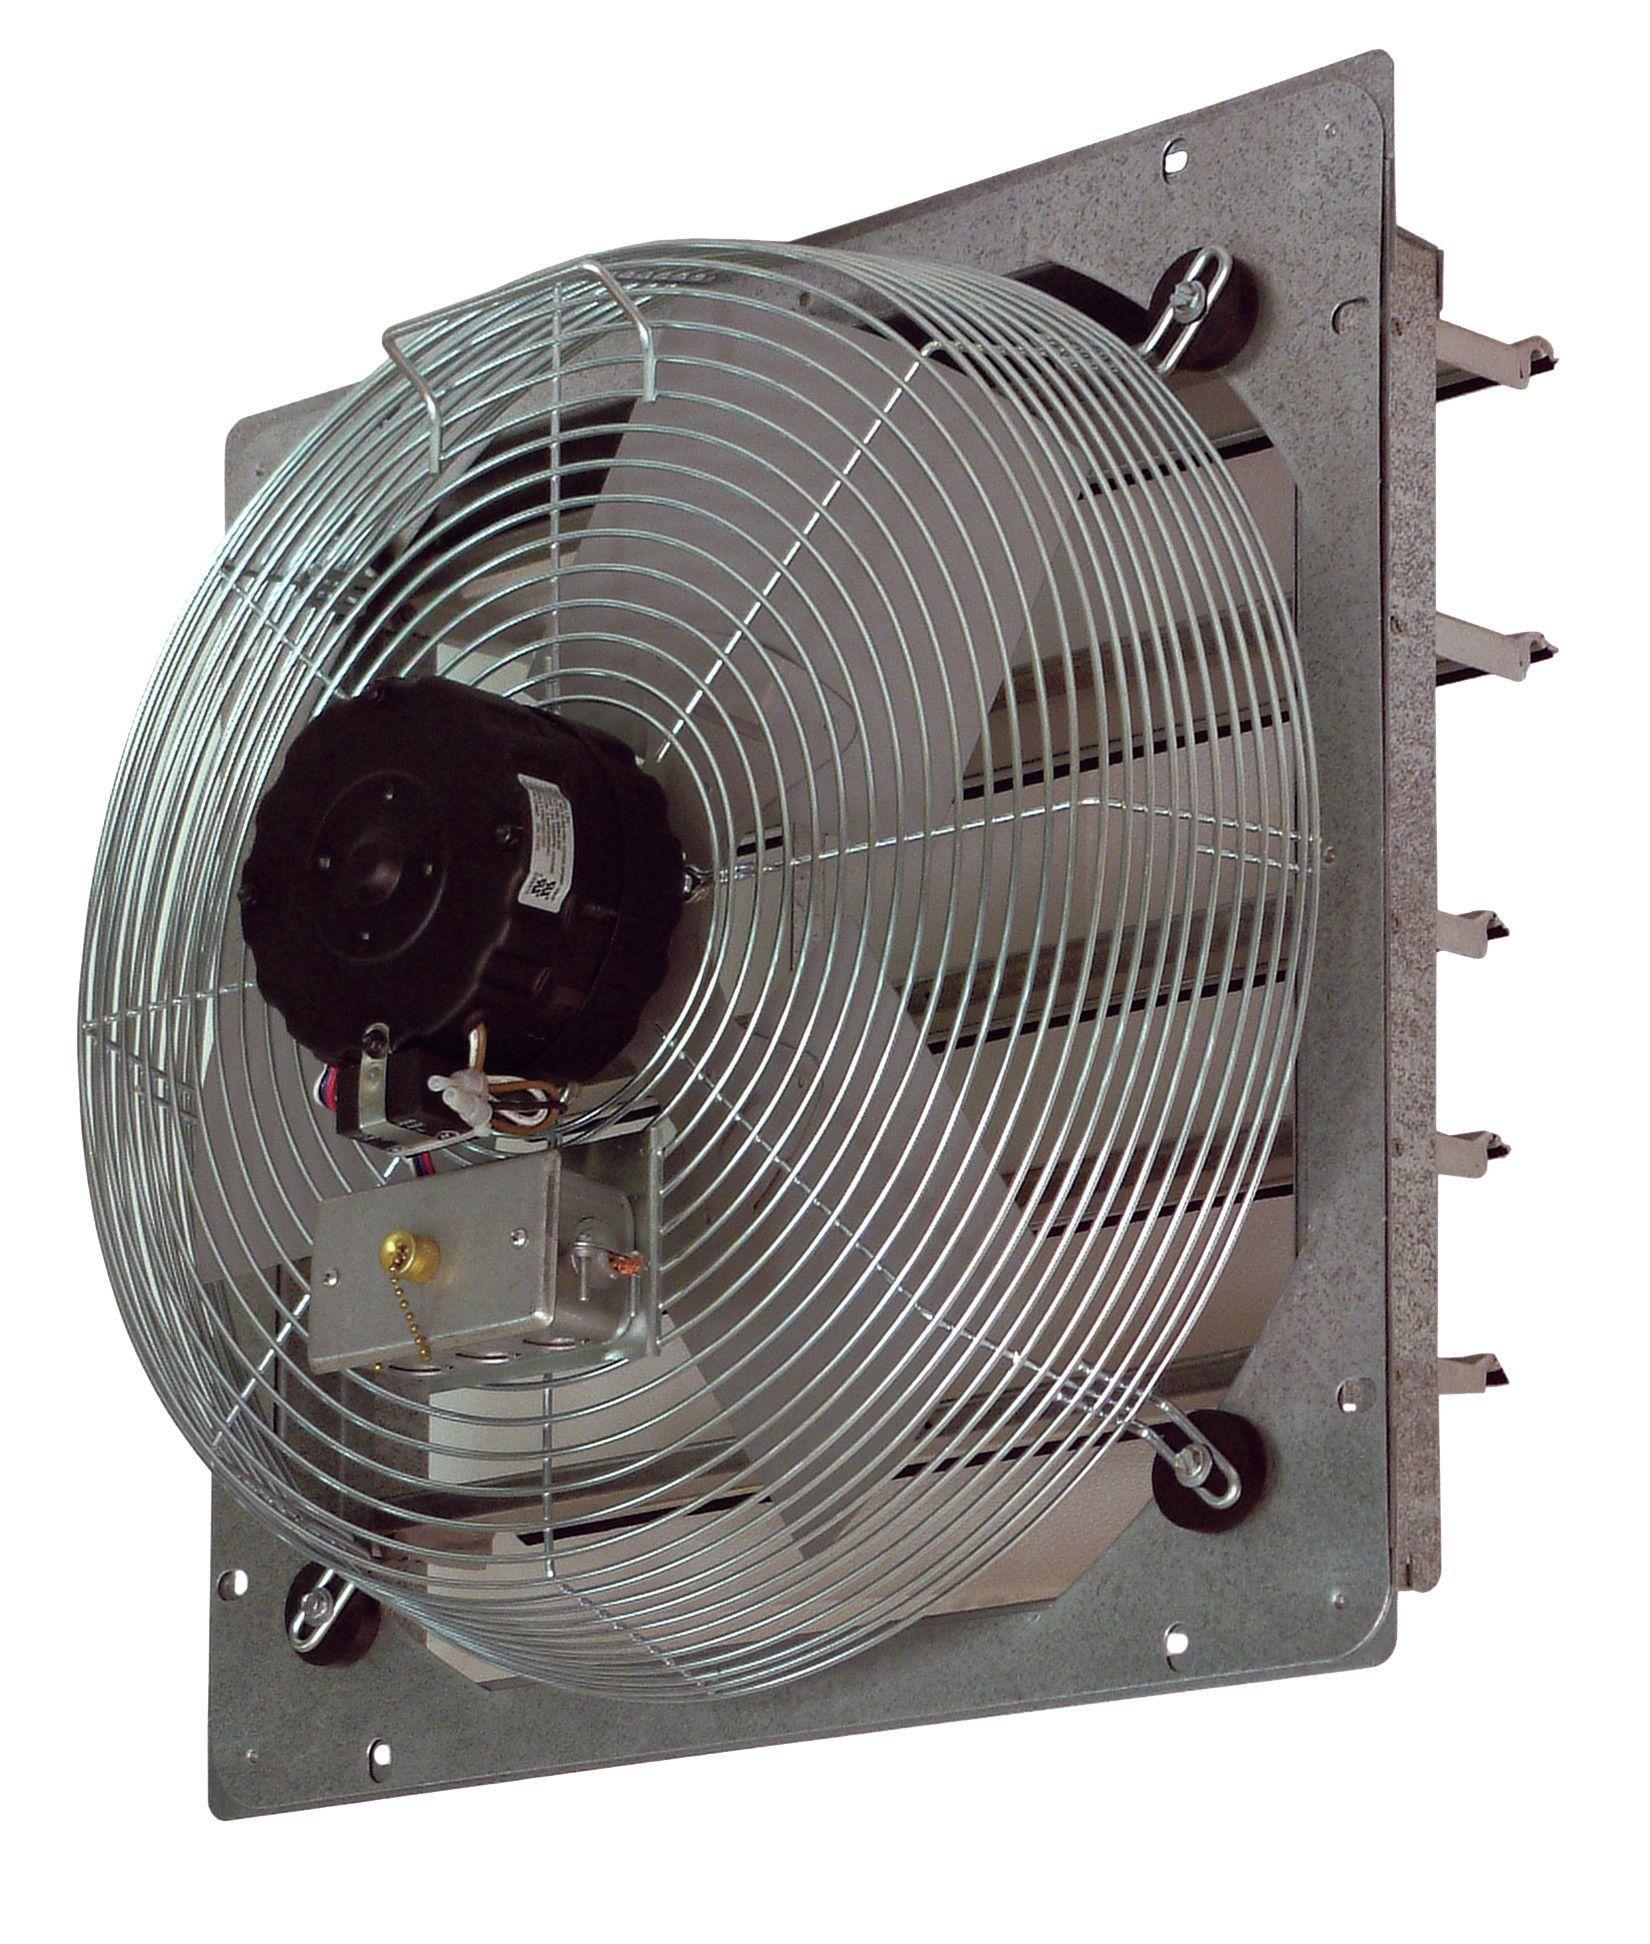 Clic 12 Oscillating Table Fan